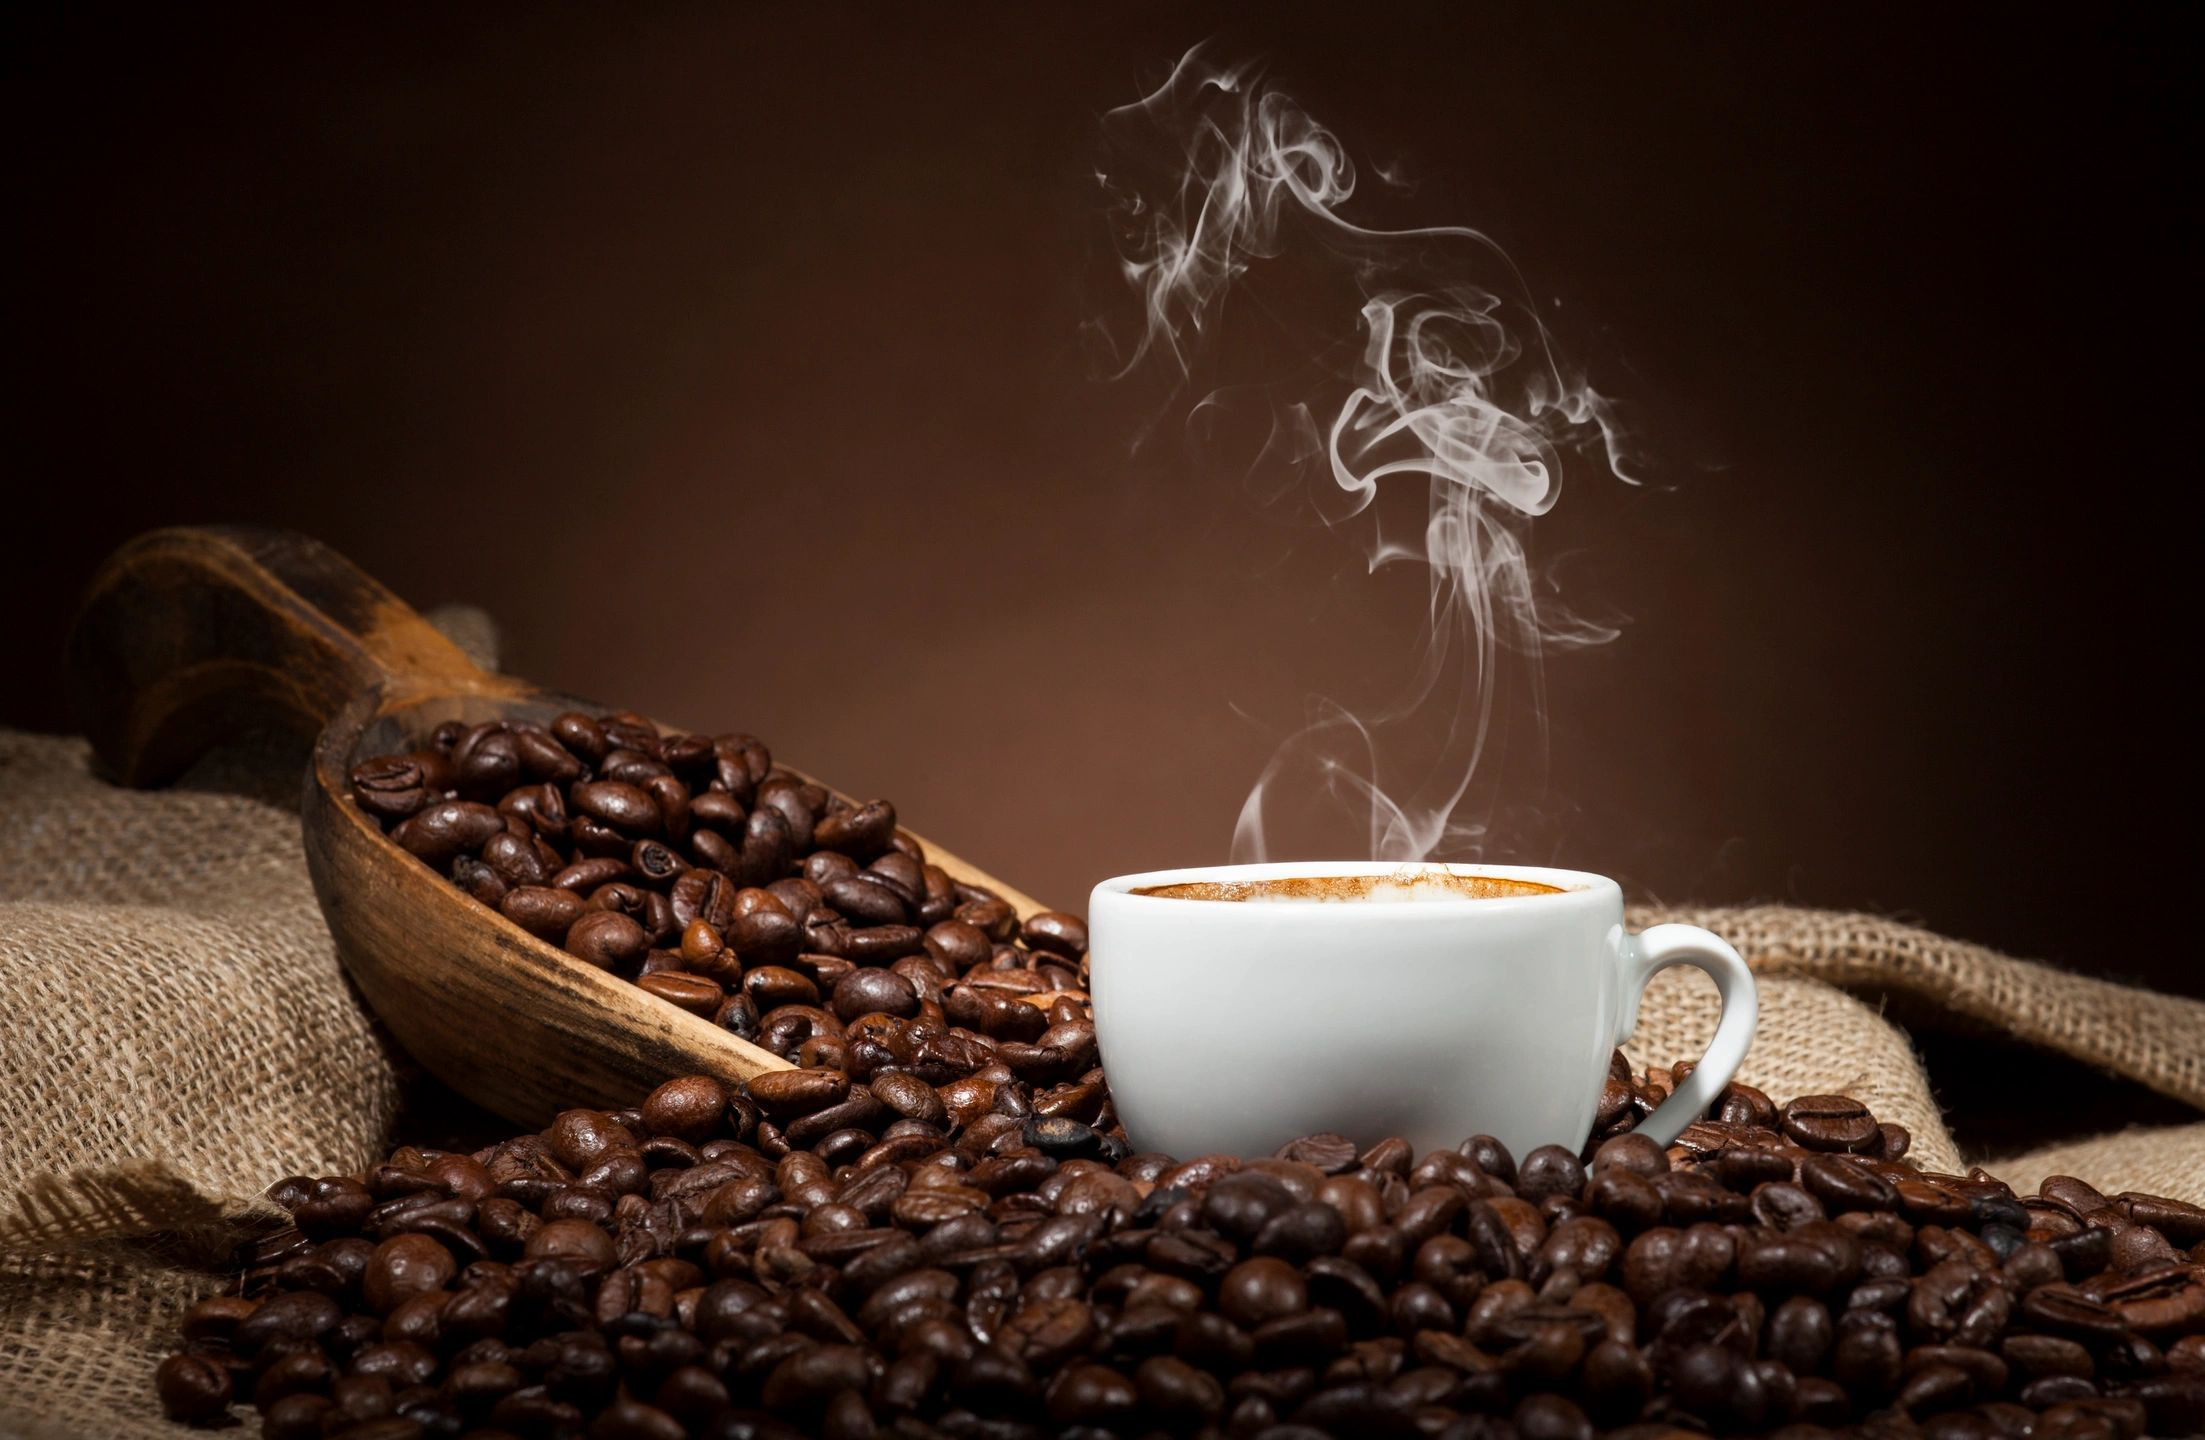 THE CUBA COFFEE COMPANY